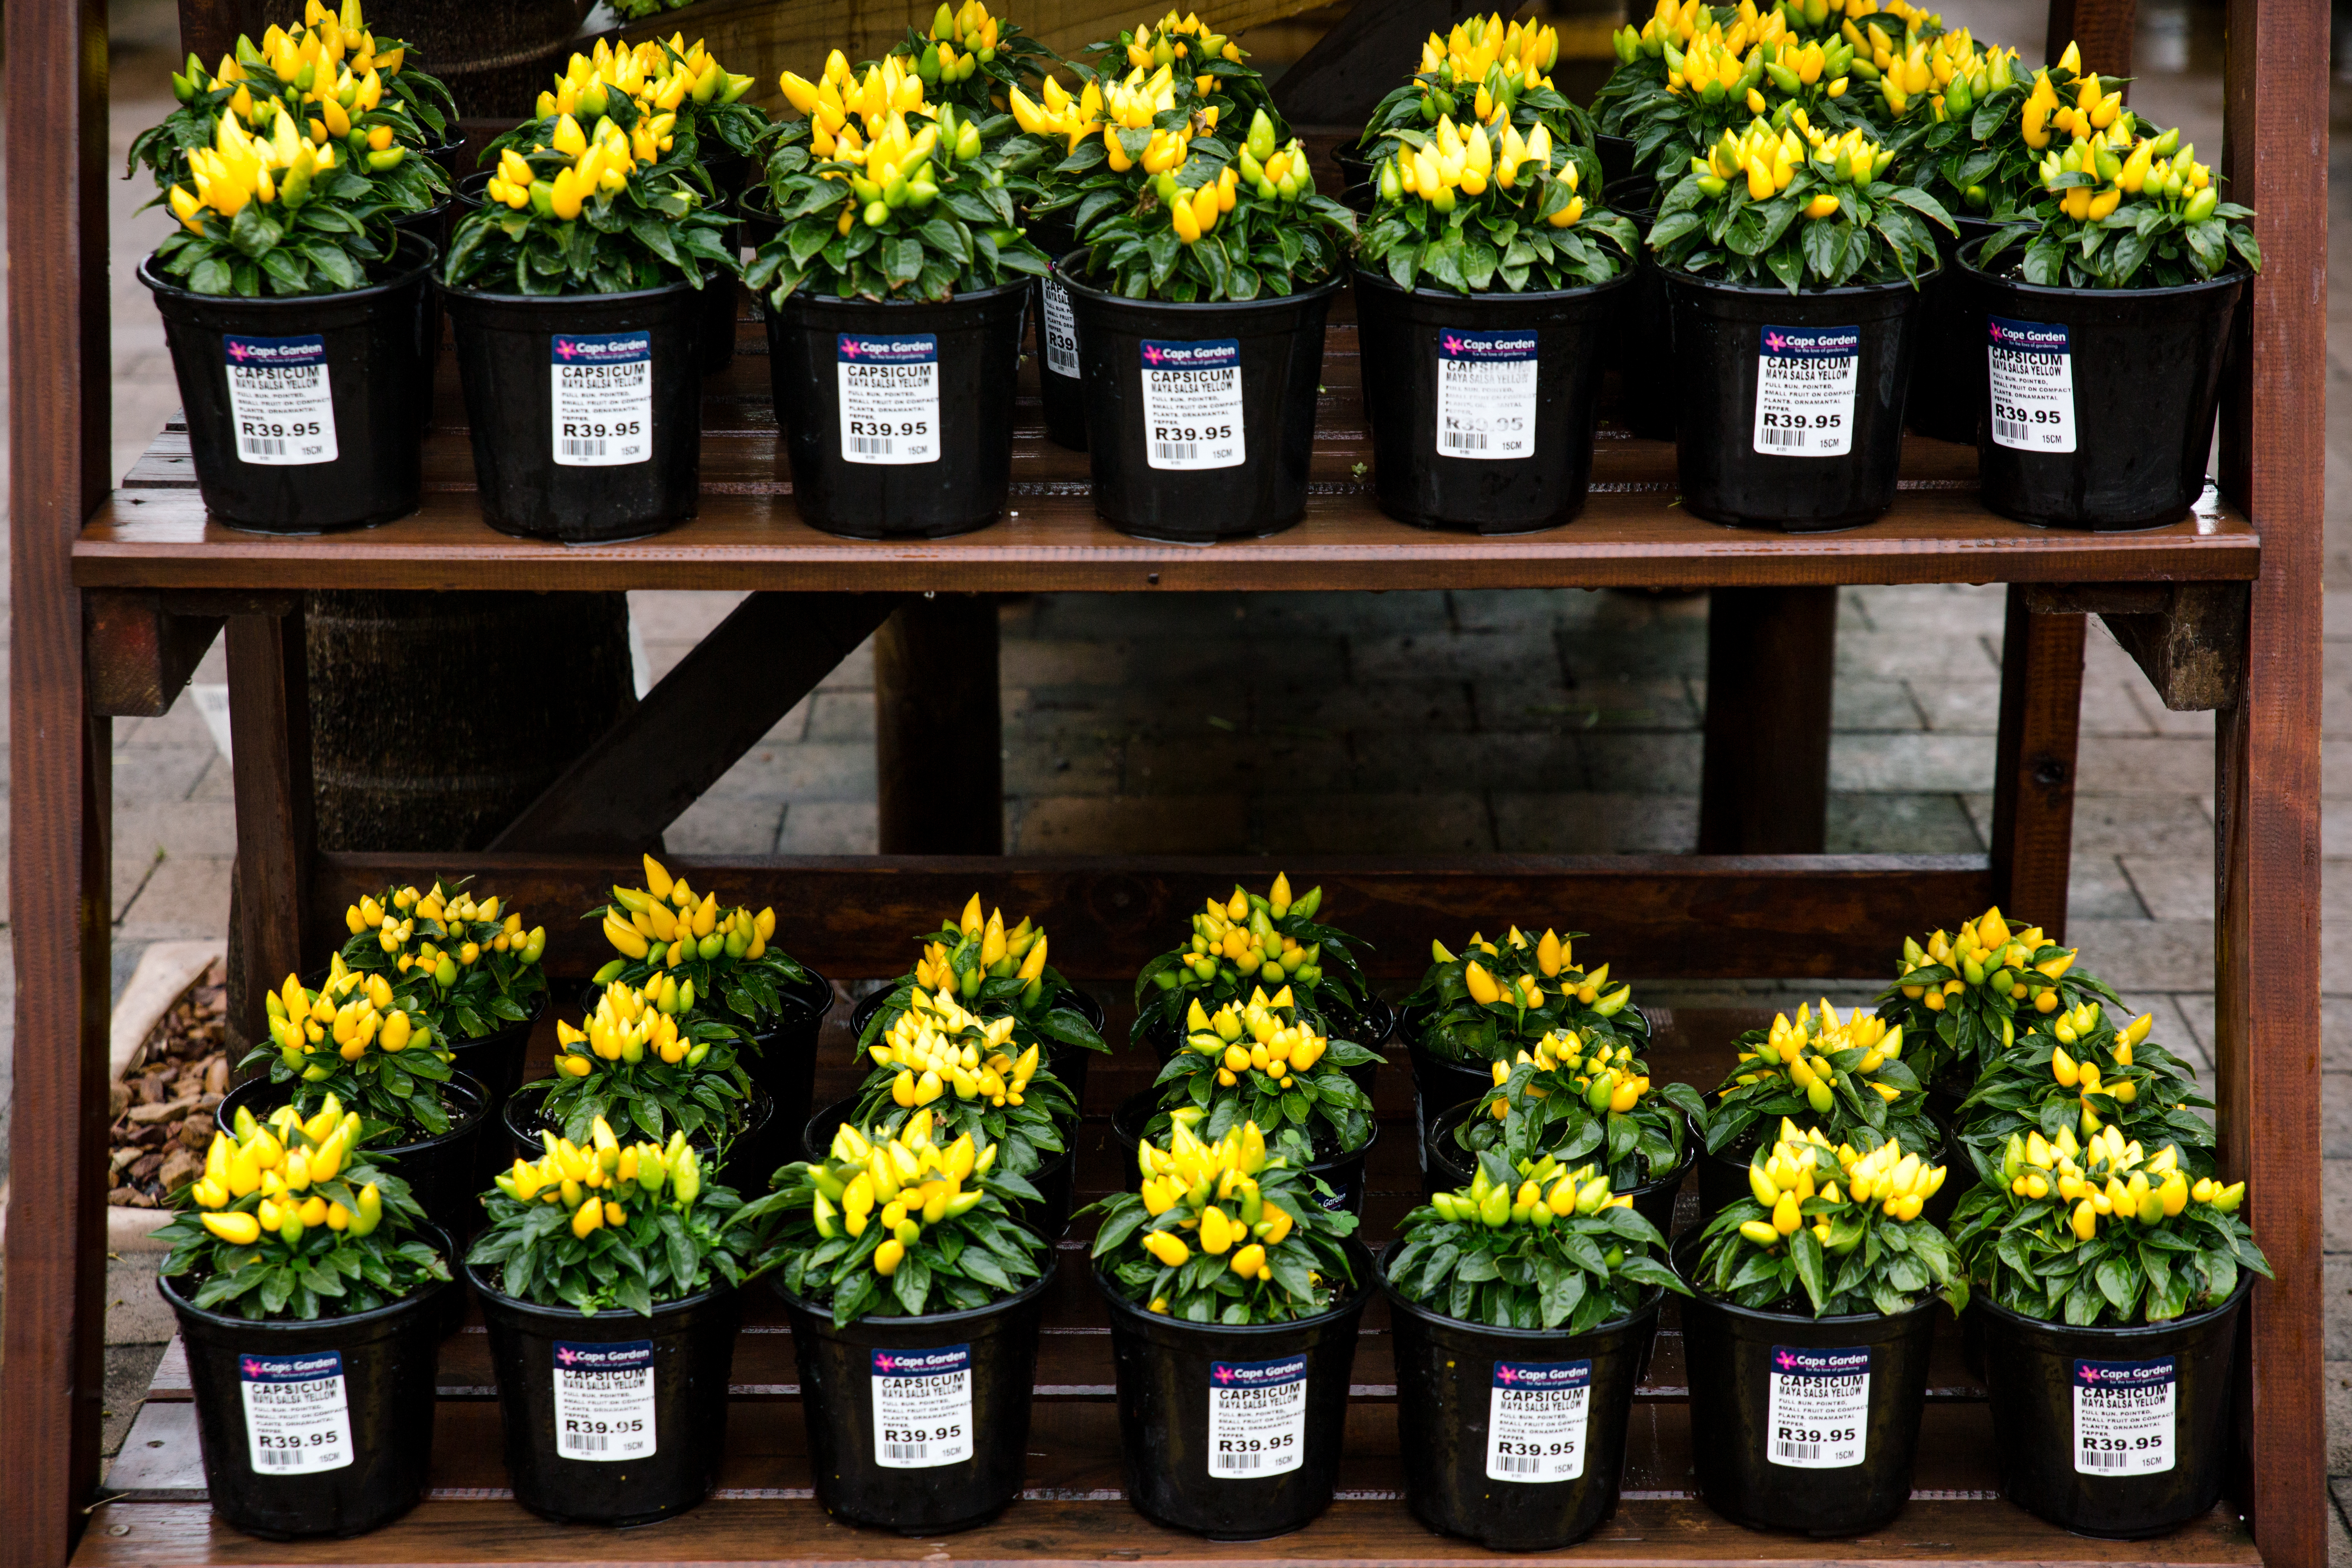 Cape Garden, flowers, nursery, plant